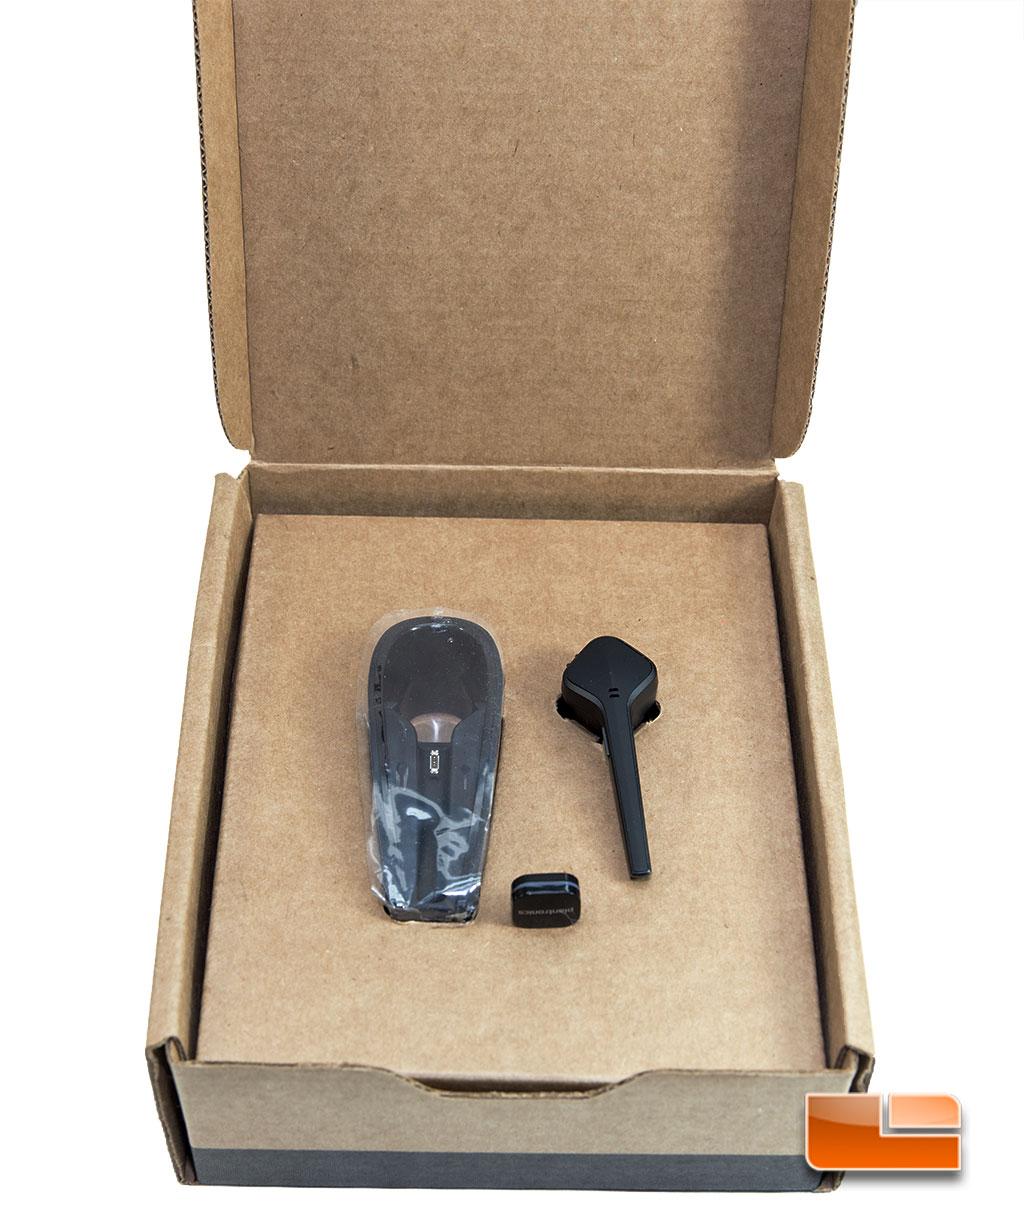 Plantronics Voyager Edge Uc Blackwire C725 Headsets Review Page Se Box